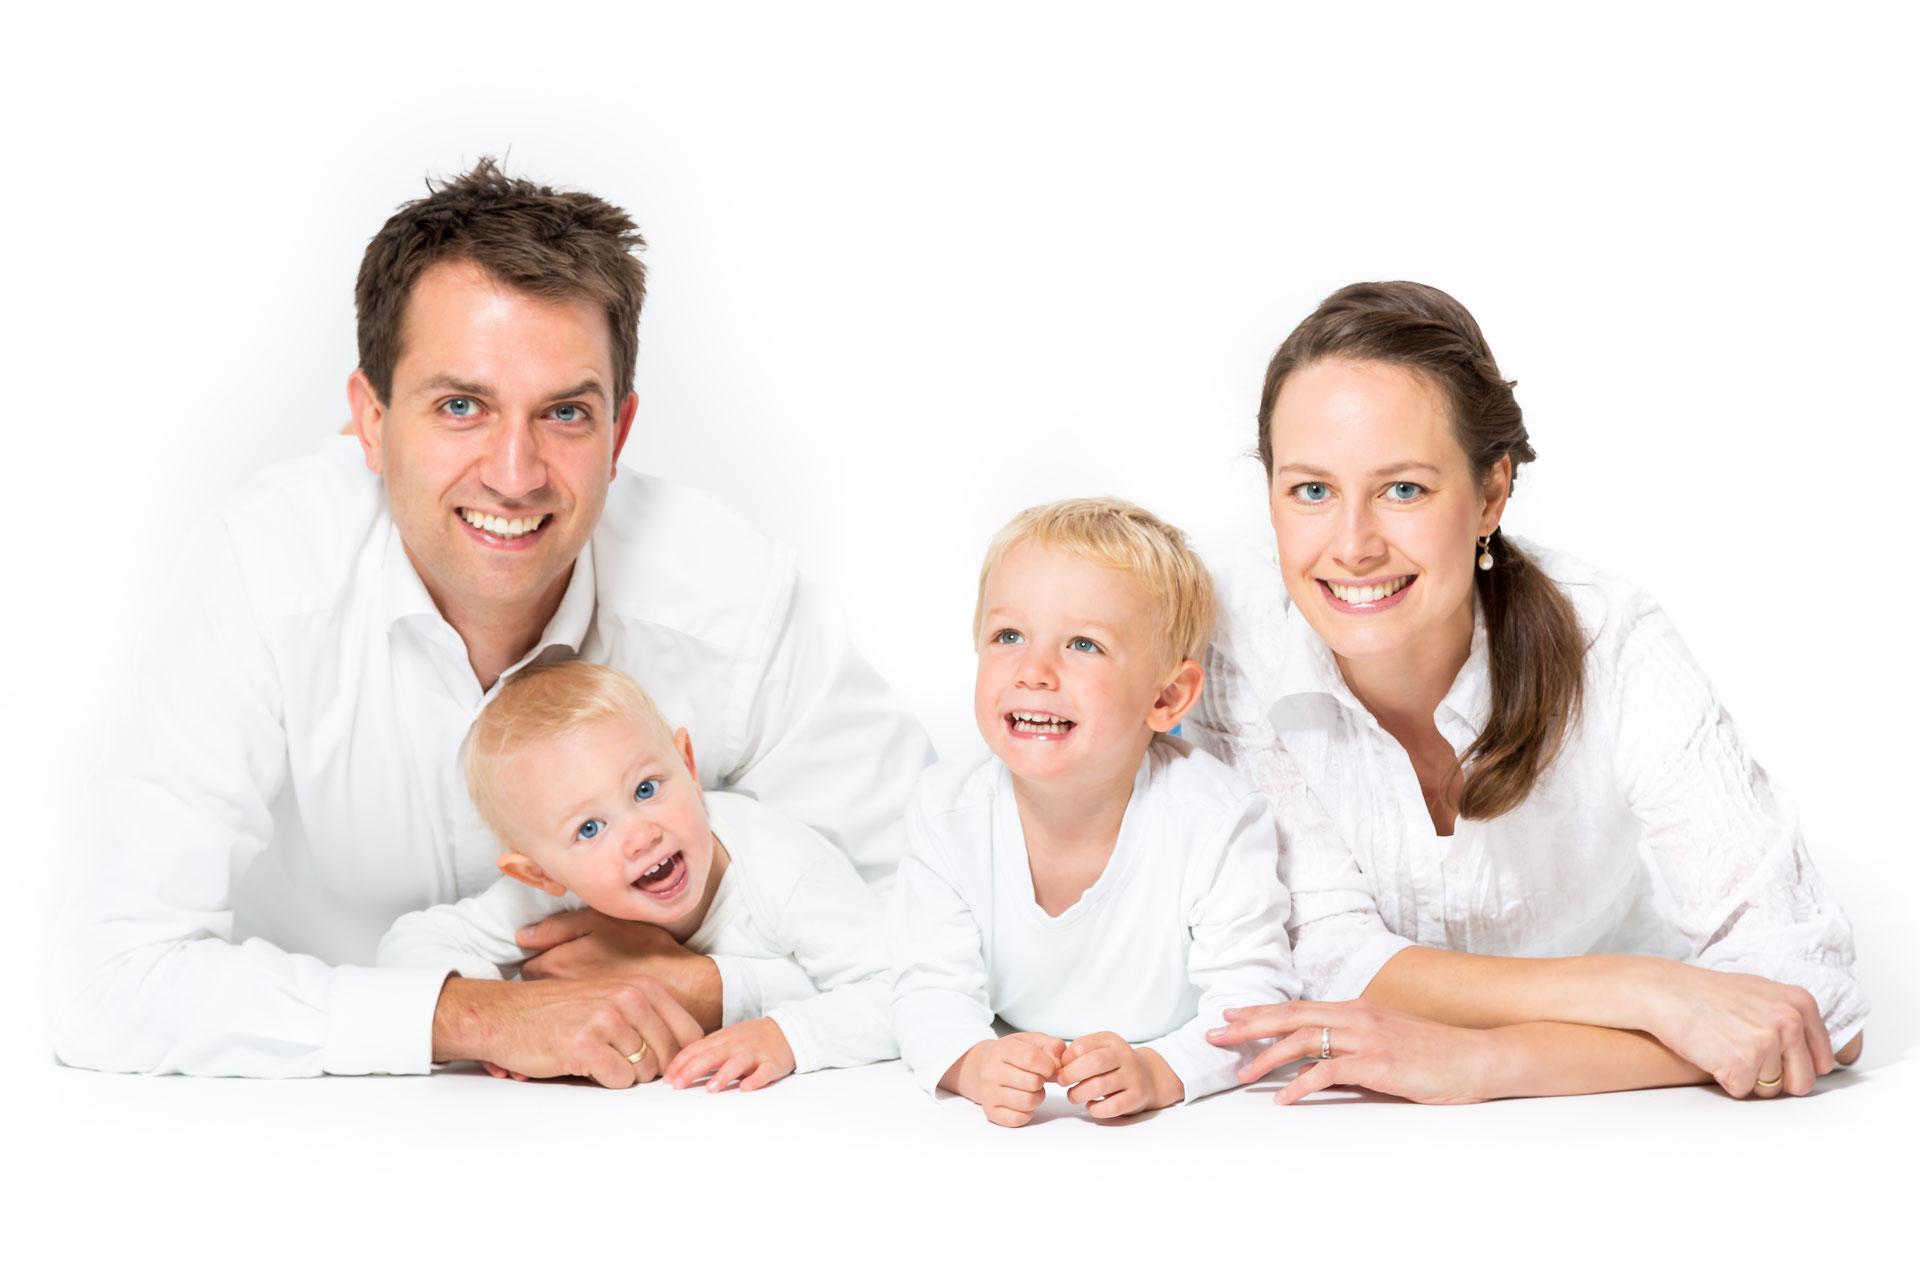 Familienfotos Familienfotoshooting Lbeck Ratzeburg